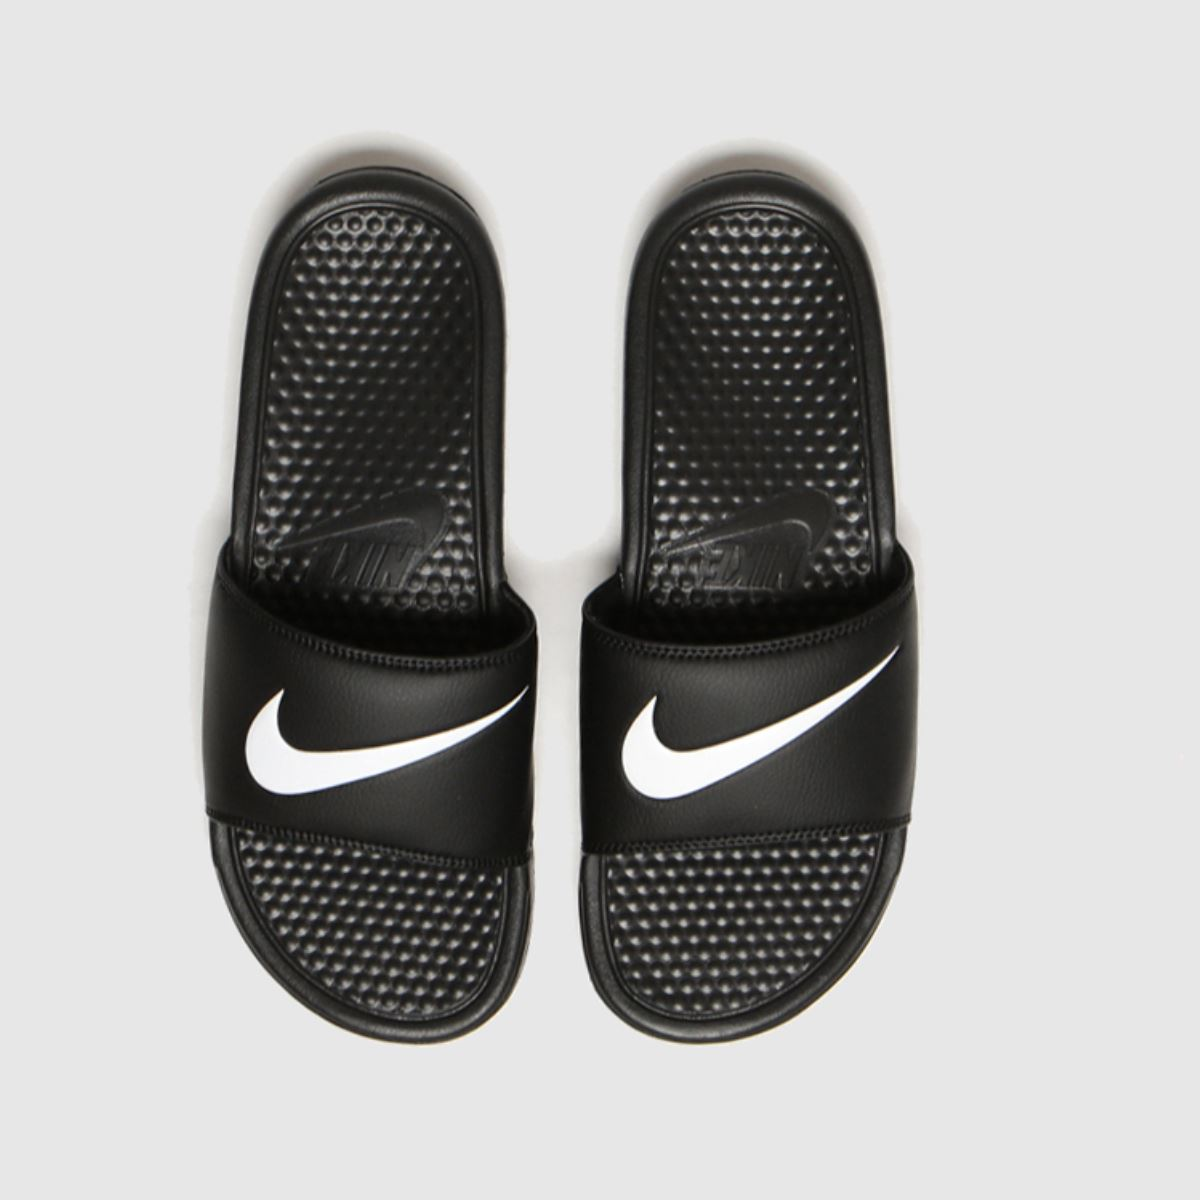 Nike Black & White Benassi Swoosh Sandals